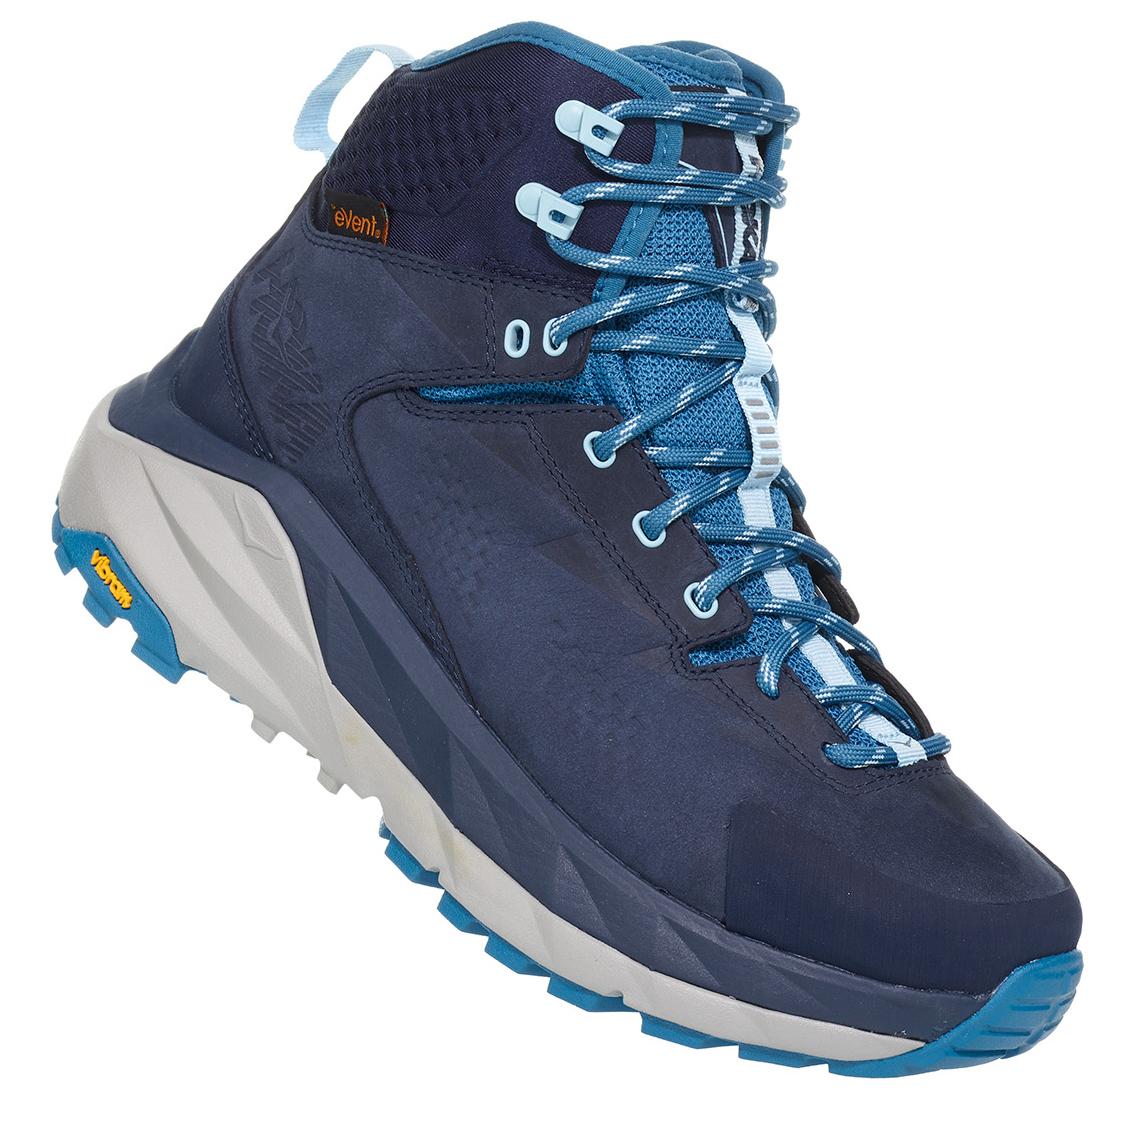 Hoka One One Sky Kaha Chaussures de randonnée Femme